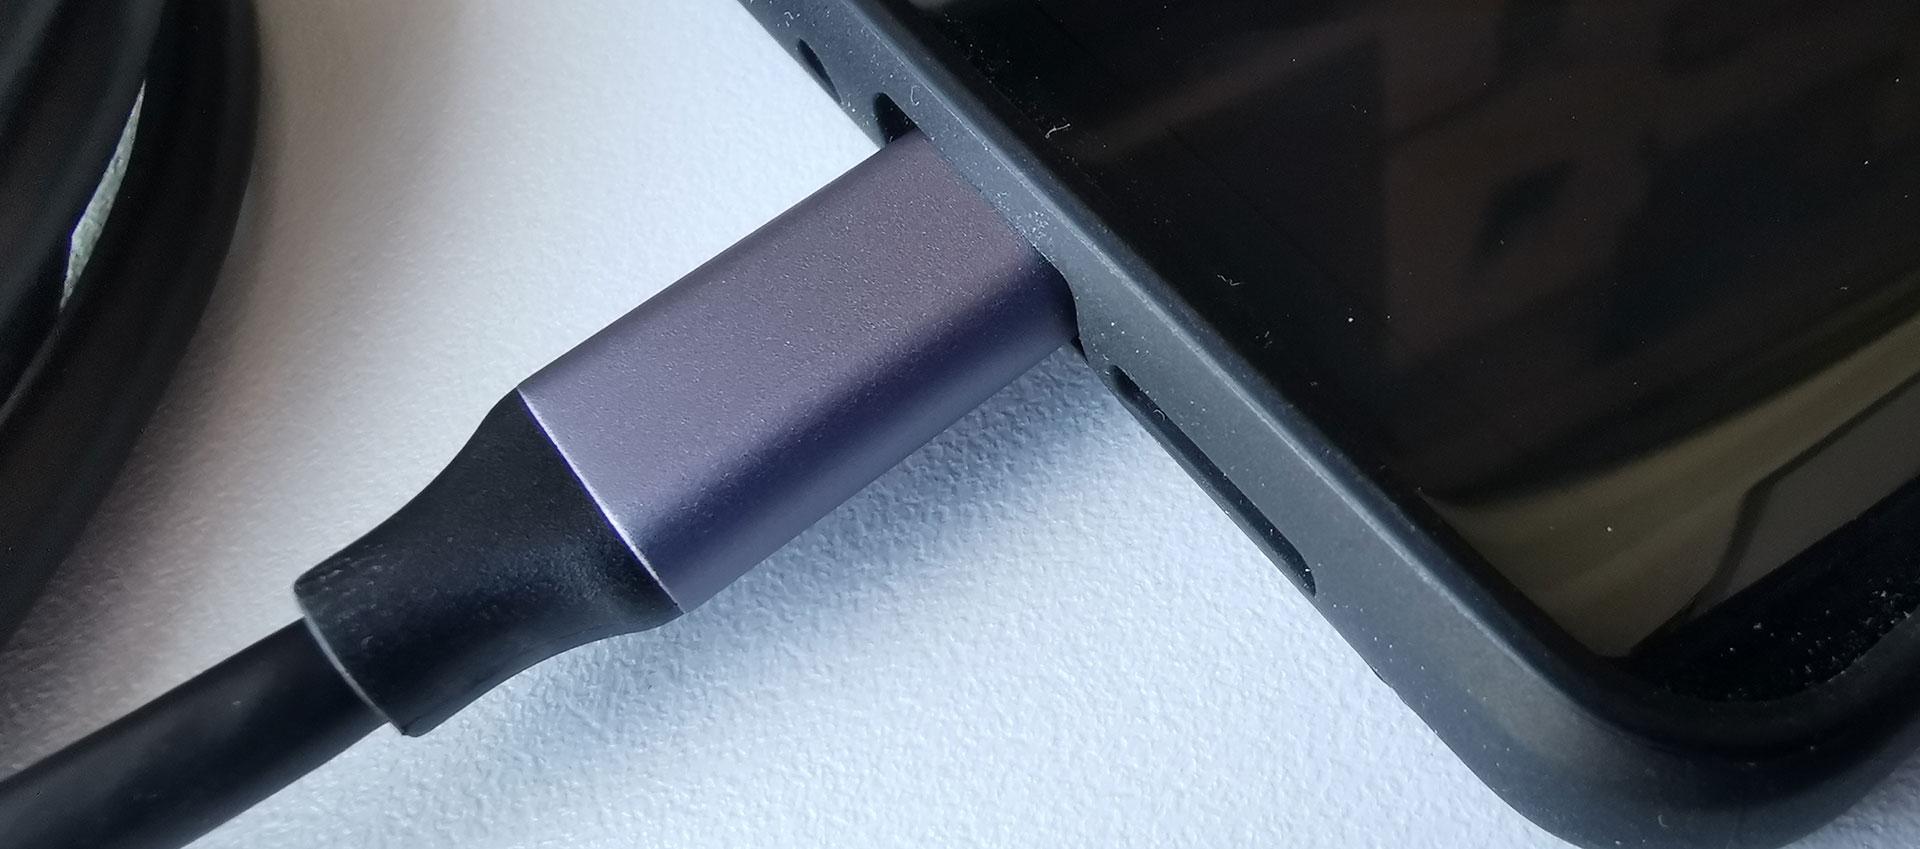 Eminent AB7875 USB-C to DisplayPort 4K Connection Cable USB-C aansluiting